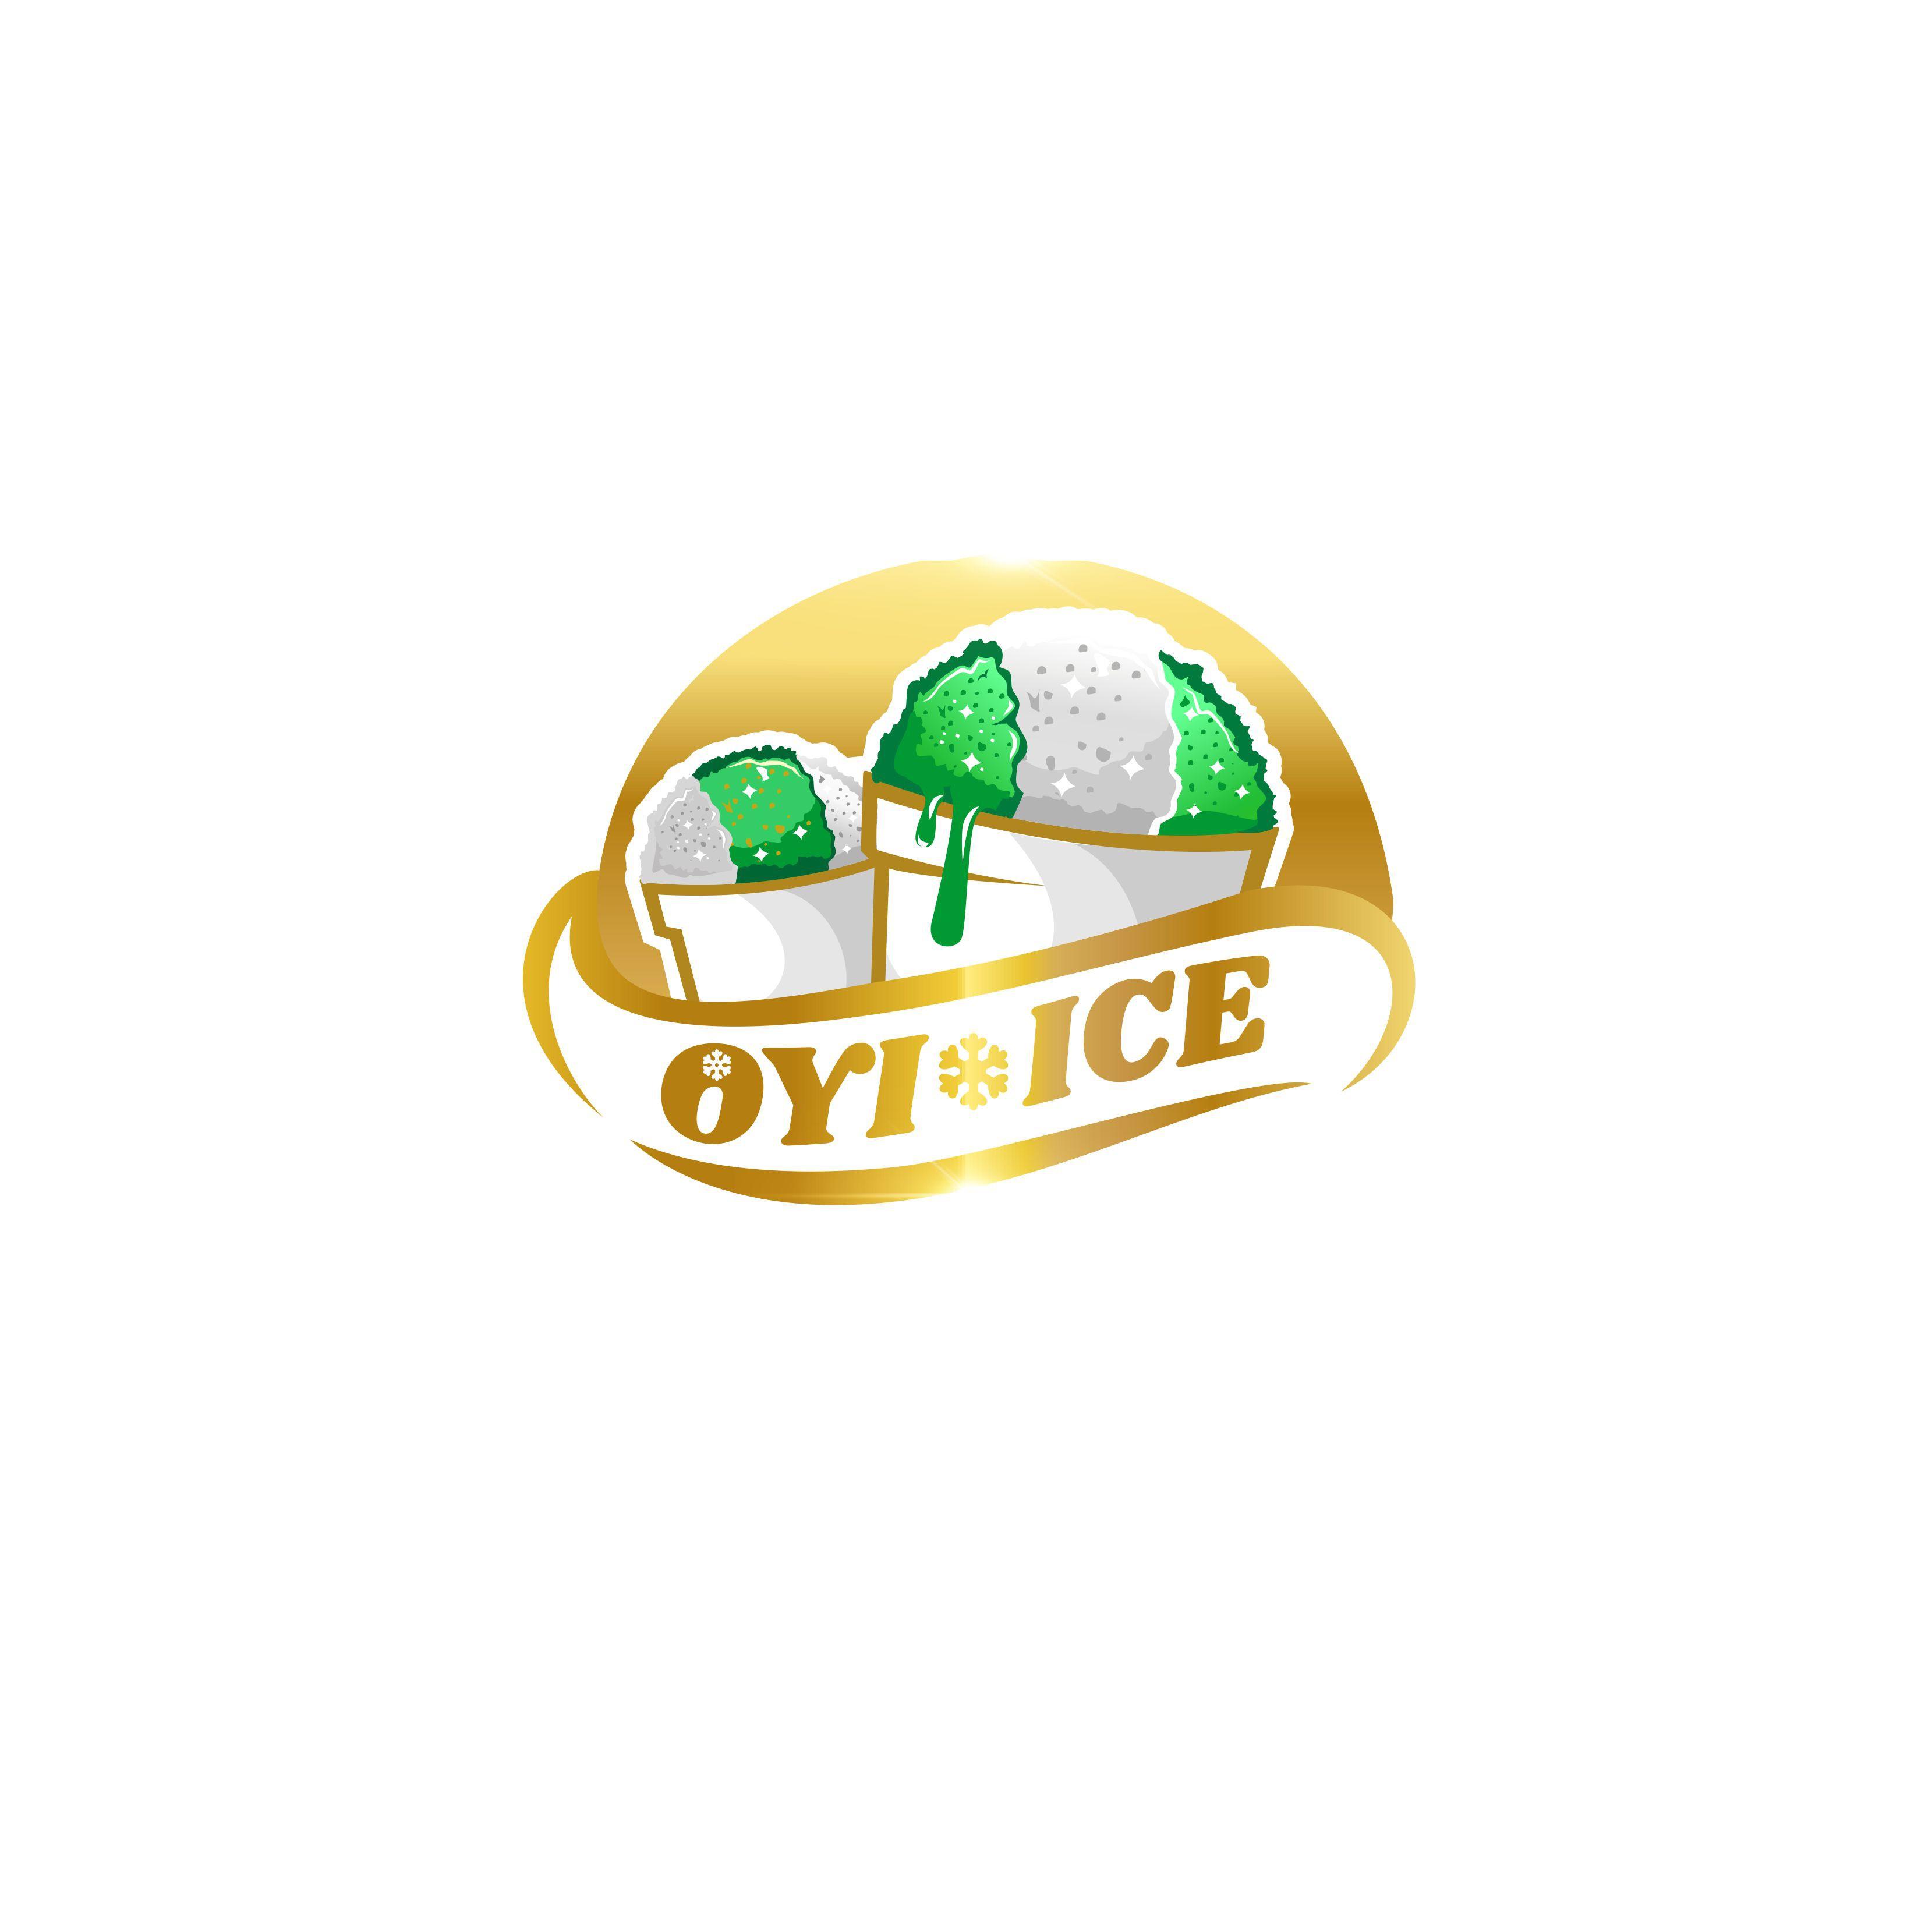 OYI ICE brand logo contest